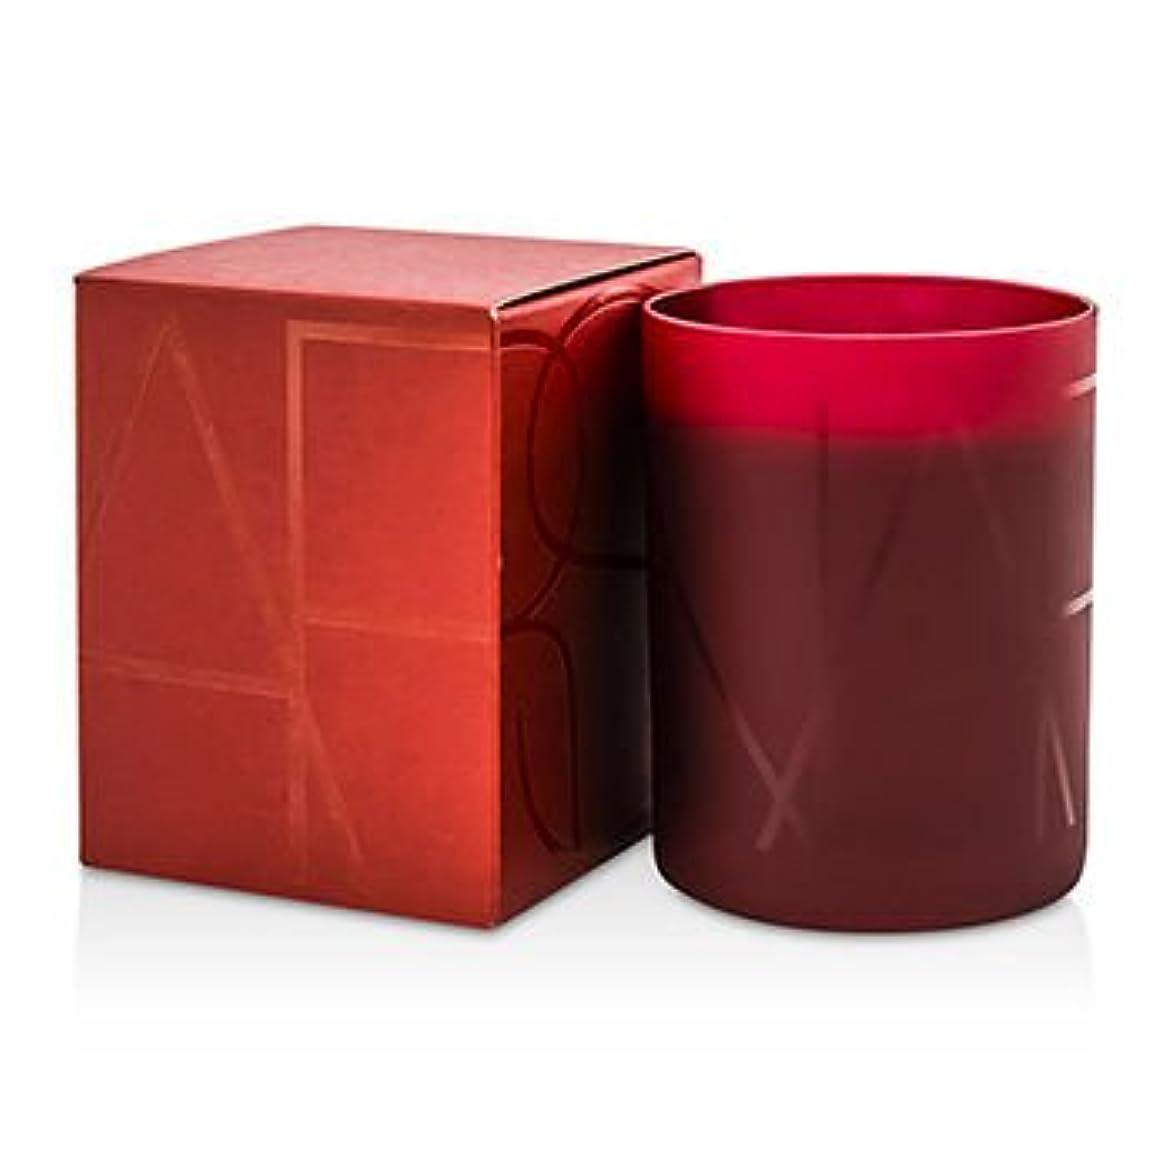 合意終点甘味[NARS] Candle - Jaipur 270g/9.5oz